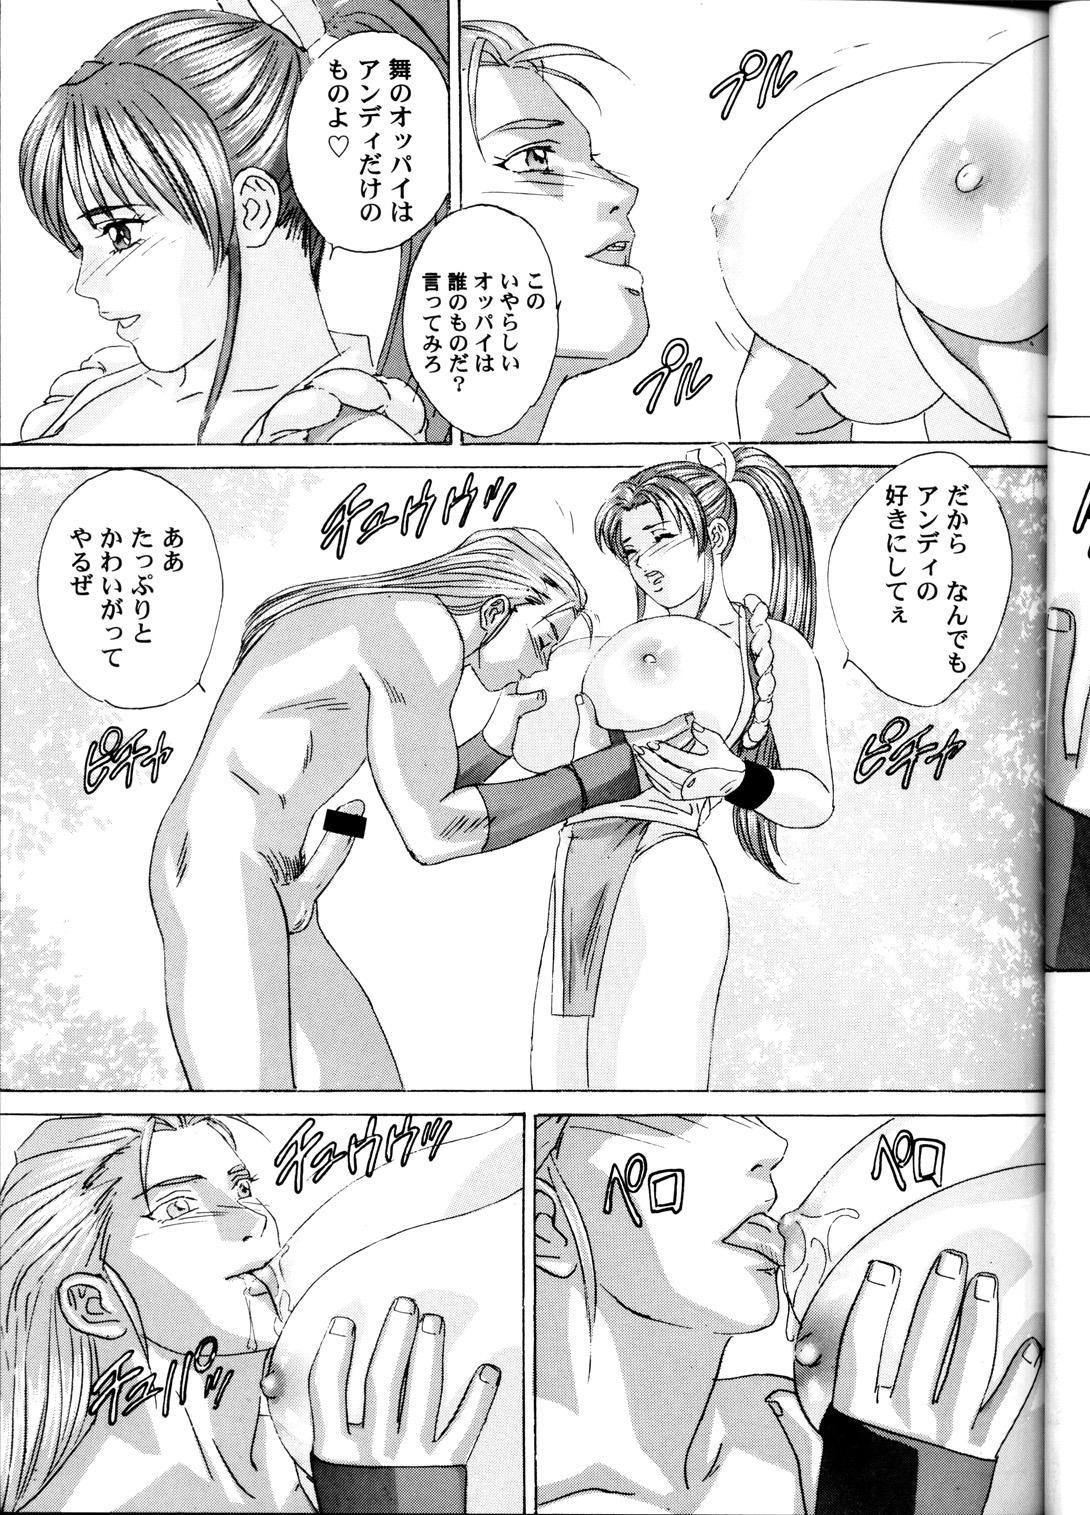 (C60) [D-LOVERS (Nishimaki Tohru)] Mai -Innyuuden- Daiichigou (King of Fighters) 17